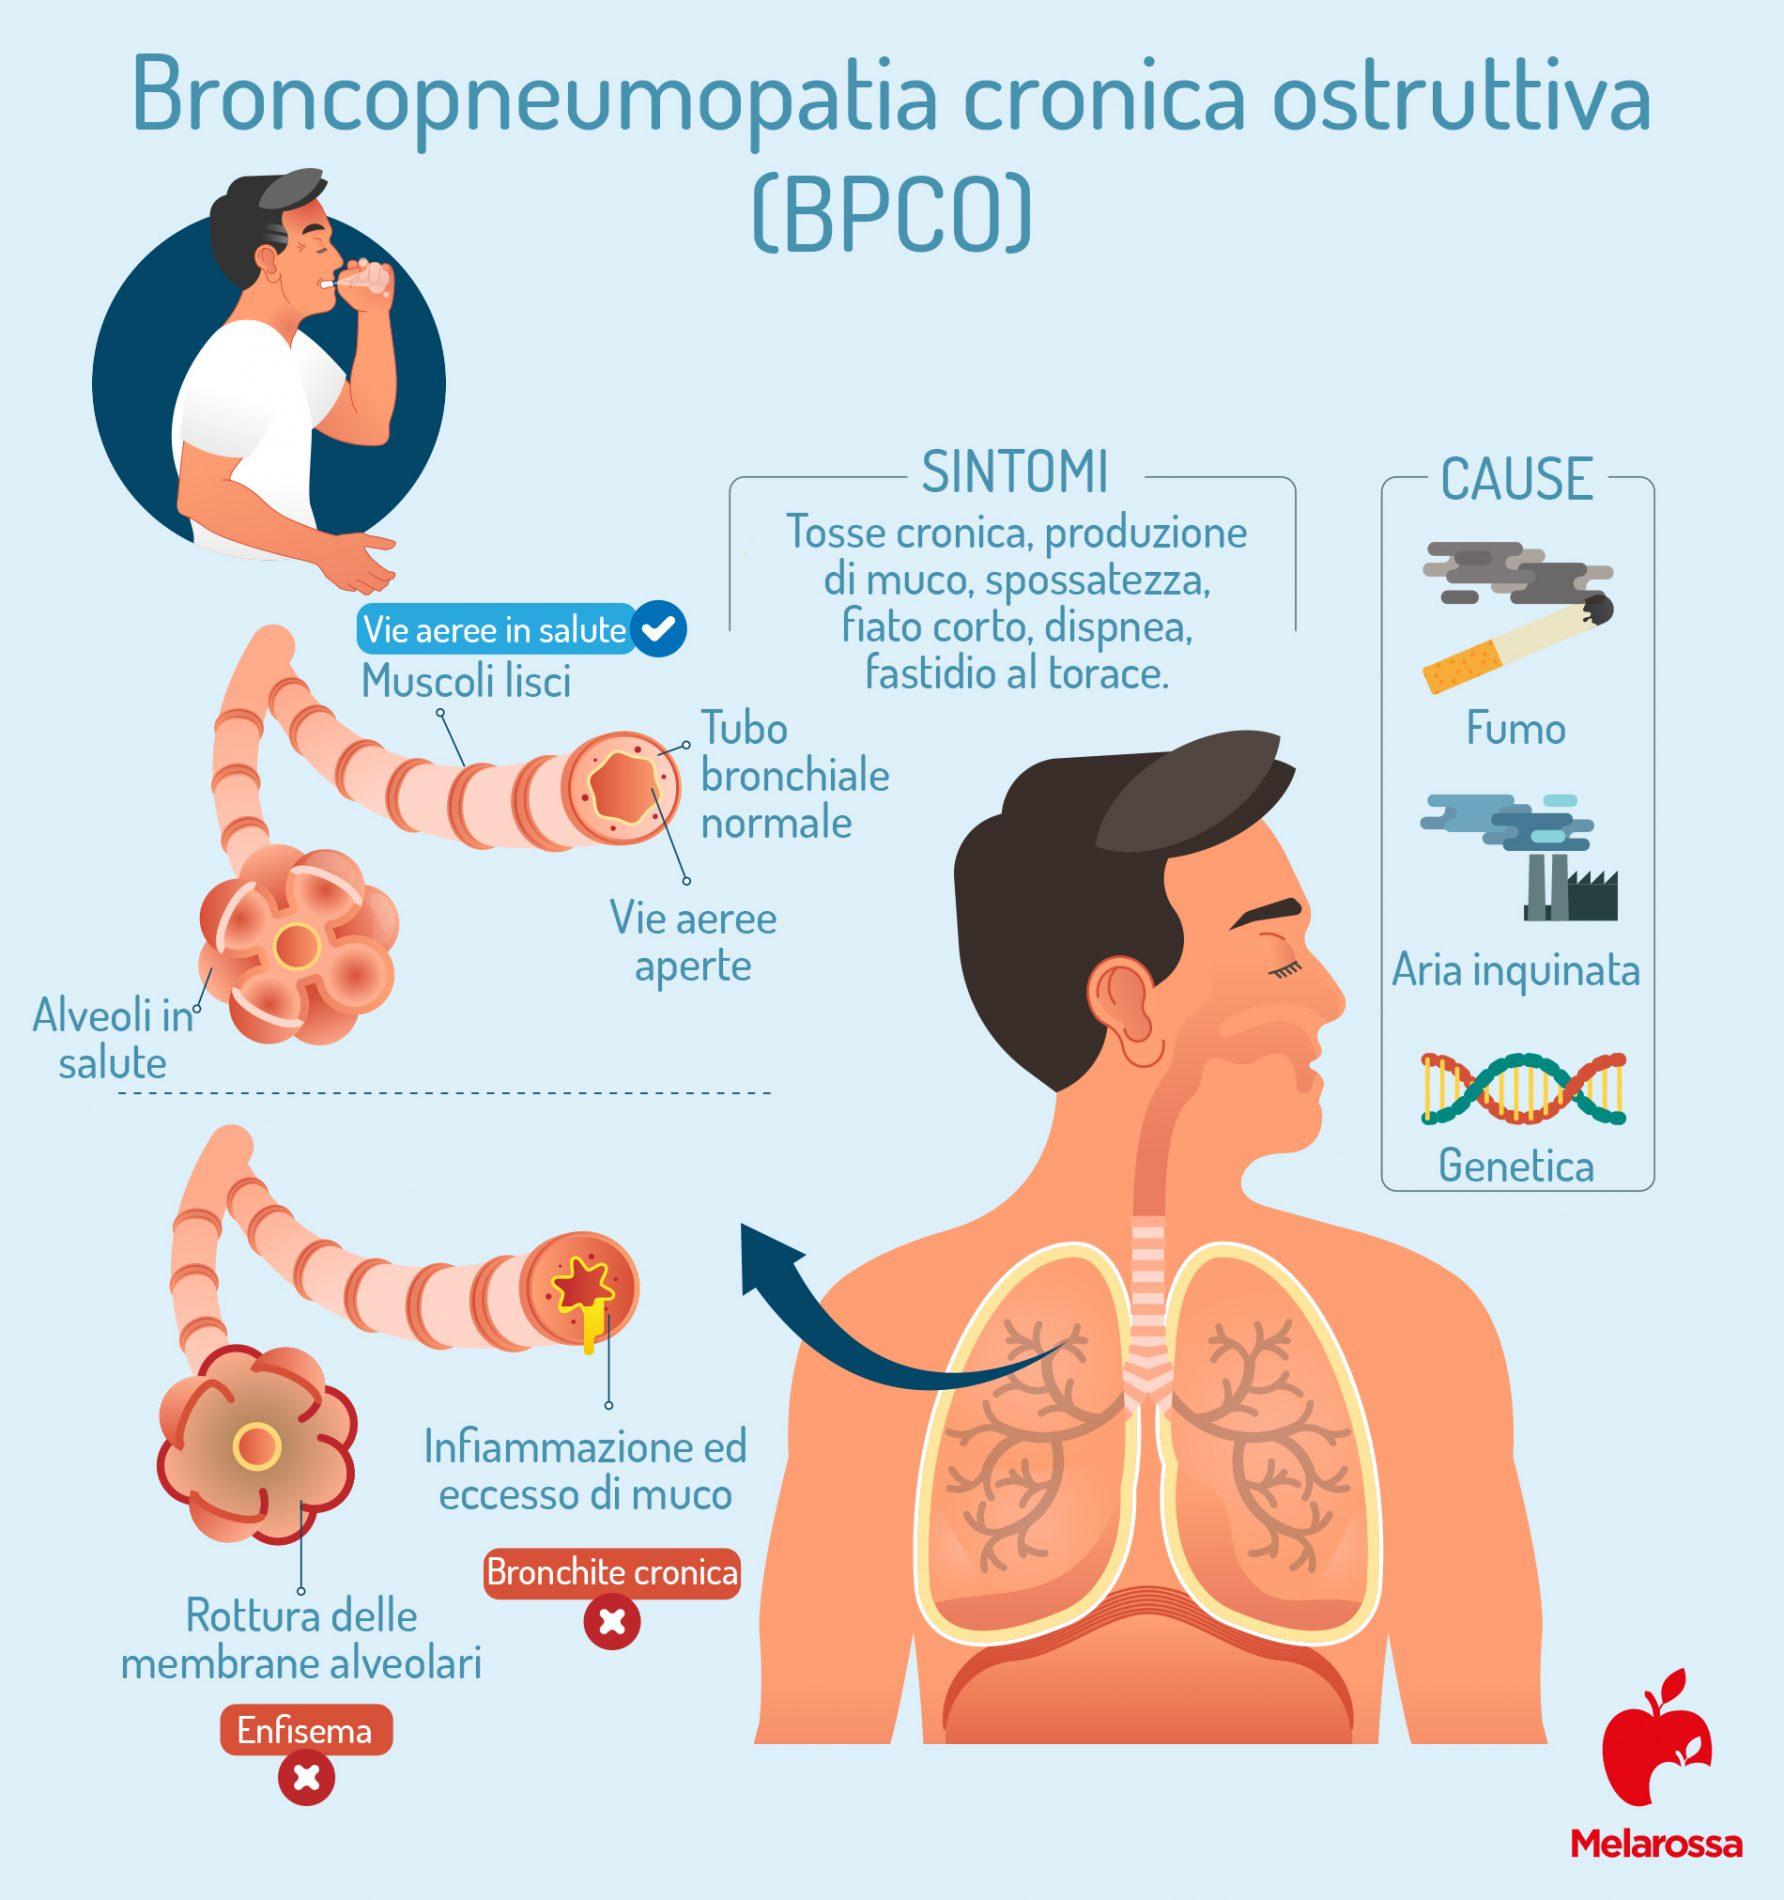 Broncopneumopatia cronica ostruttiva: cause e sintomi